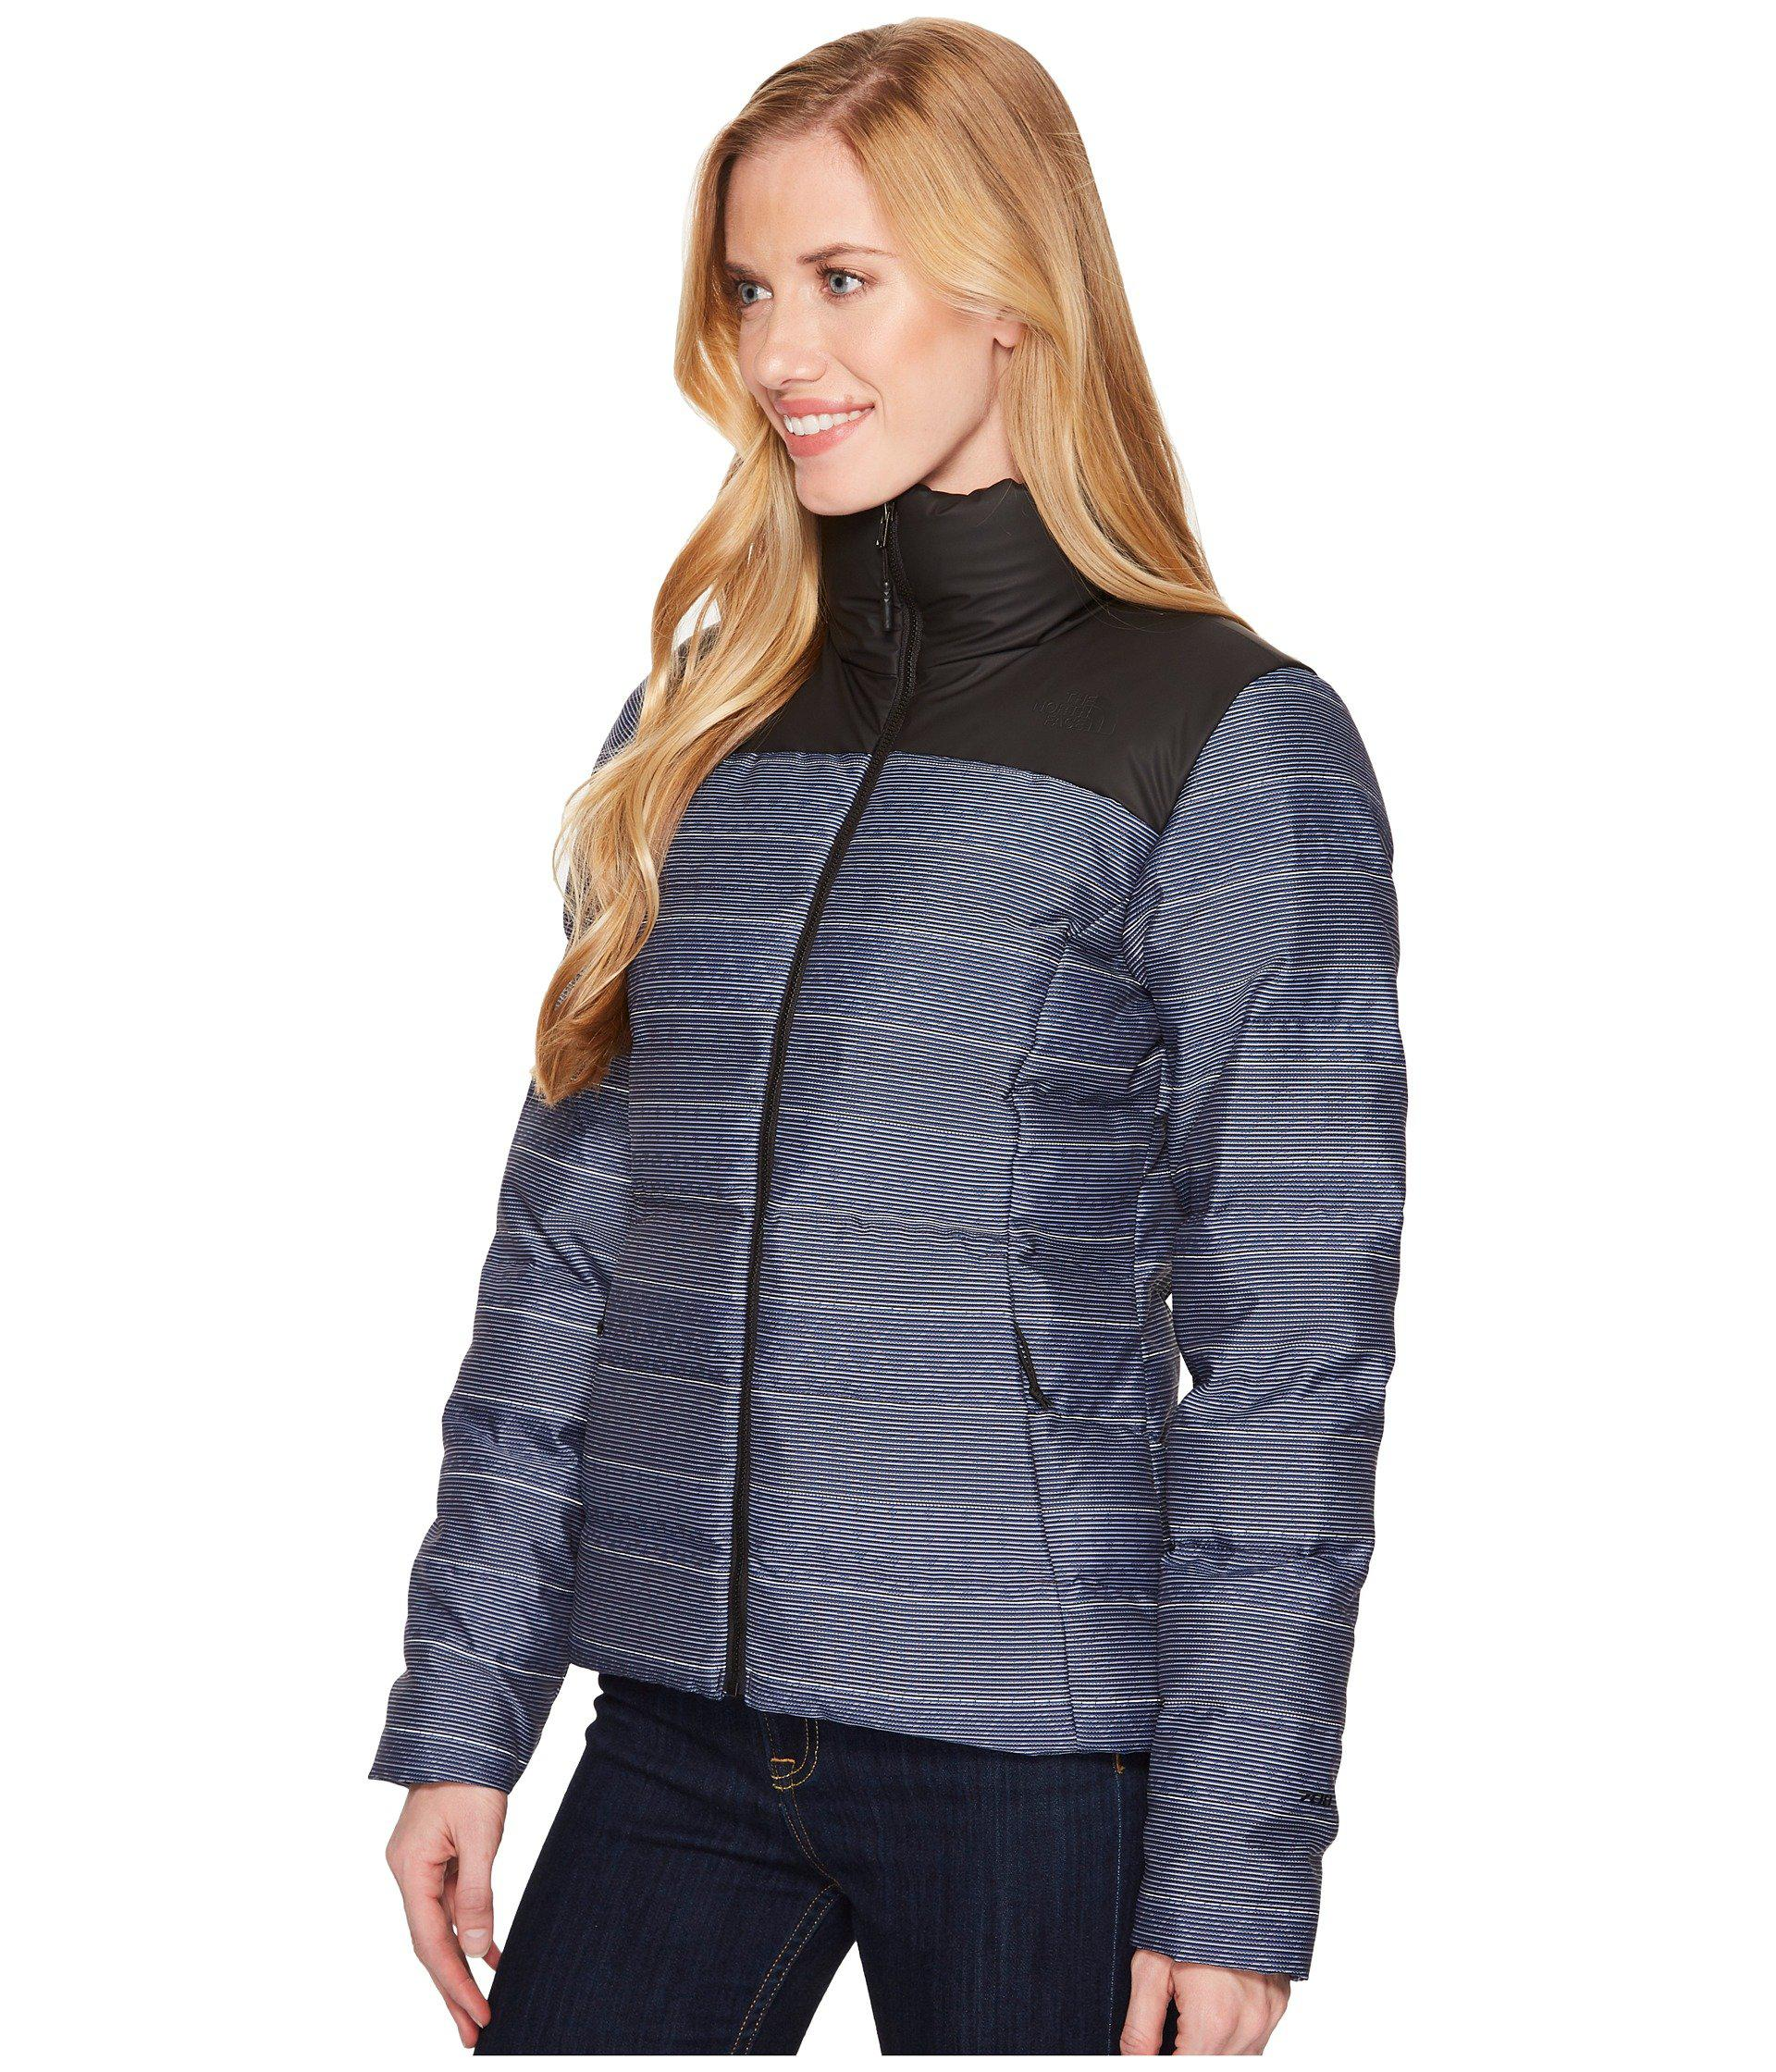 Lyst - The North Face Nuptse Jacket (mid Grey tnf Black) Women s Jacket in  Blue ead50c425